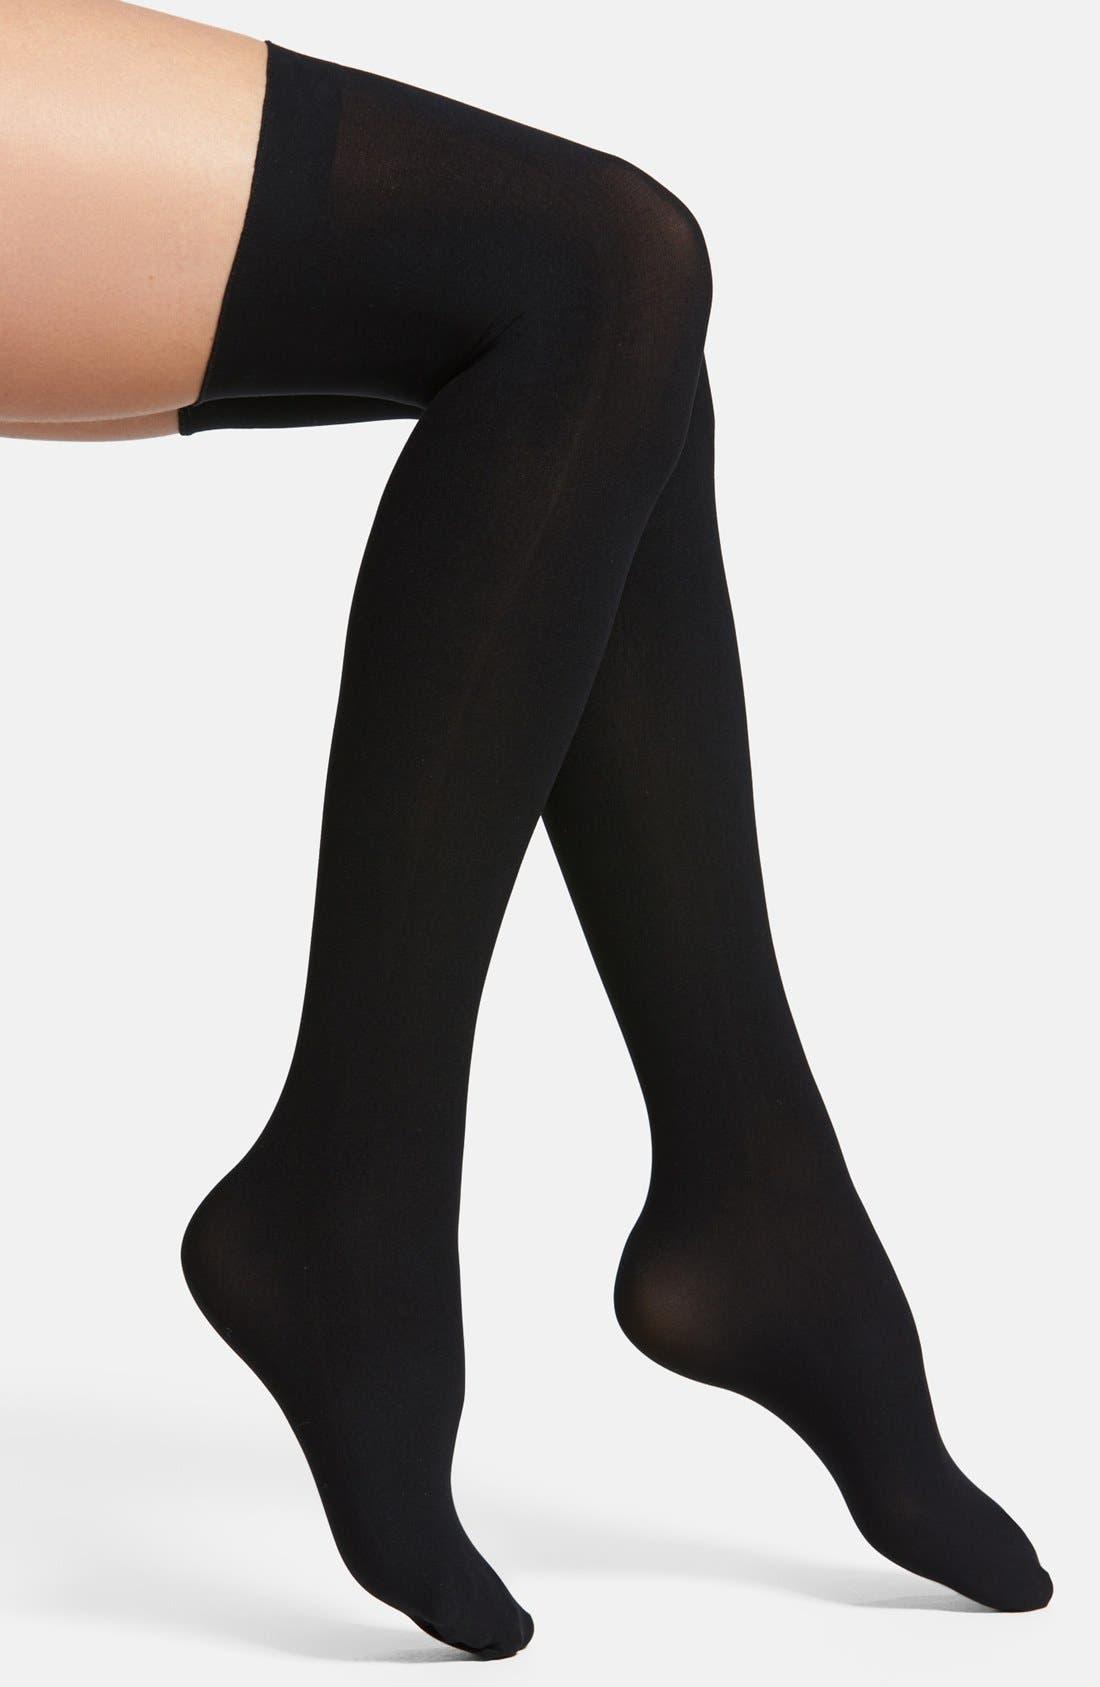 Up All Night Thigh High Socks,                             Main thumbnail 1, color,                             Black